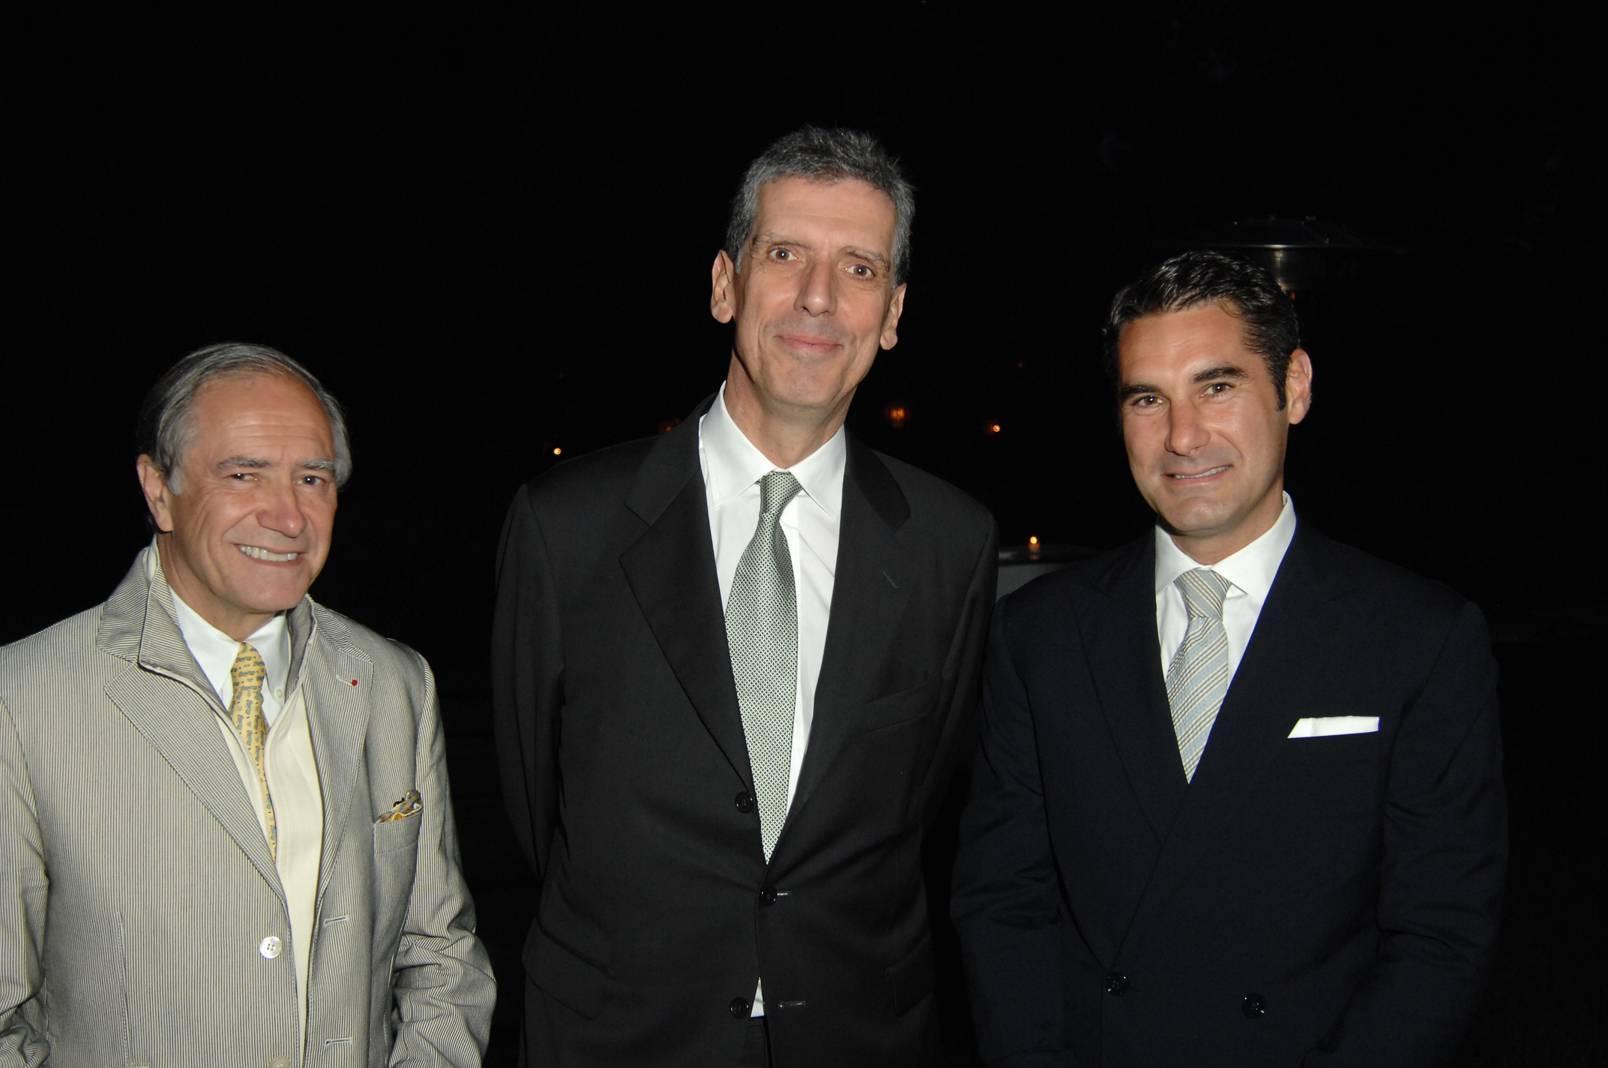 Christopher Kip Forbes, Henri Loyrette, Hugues de Pins